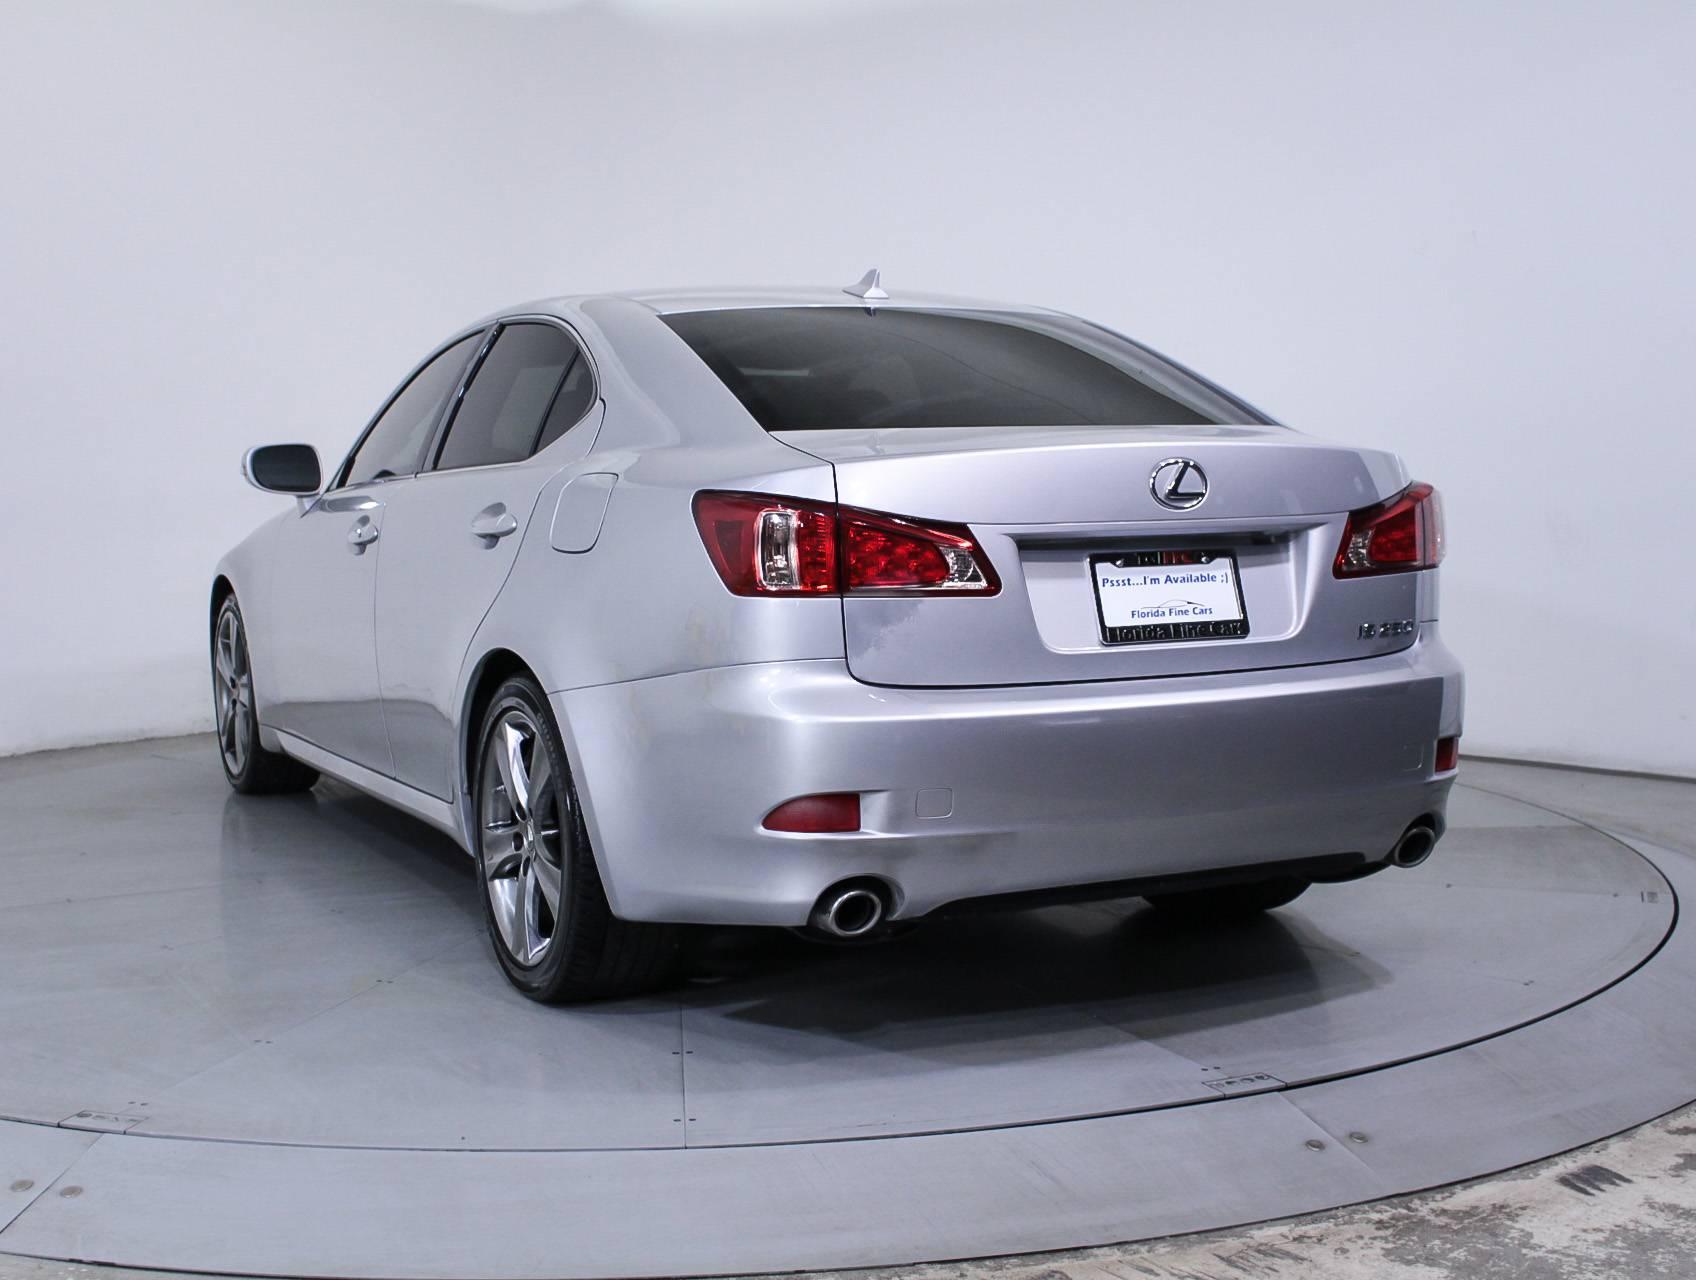 Used 2013 LEXUS IS 250 Sedan for sale in MIAMI FL